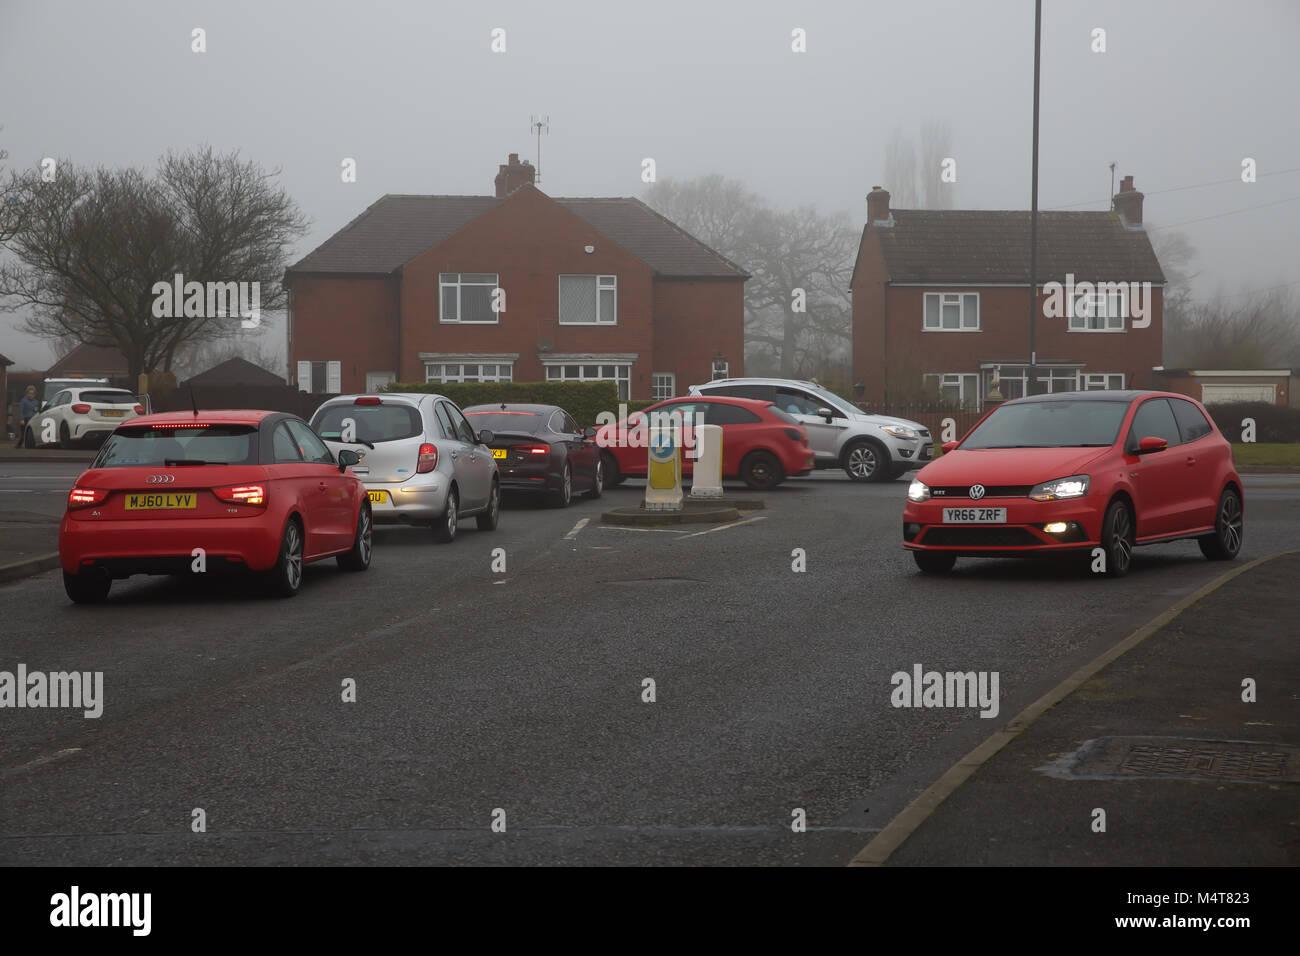 Marlborough,UK,18th February 2018,Misty and Foggy day in Barlborough Derbyshire©Keith Larby/Alamy Live News - Stock Image